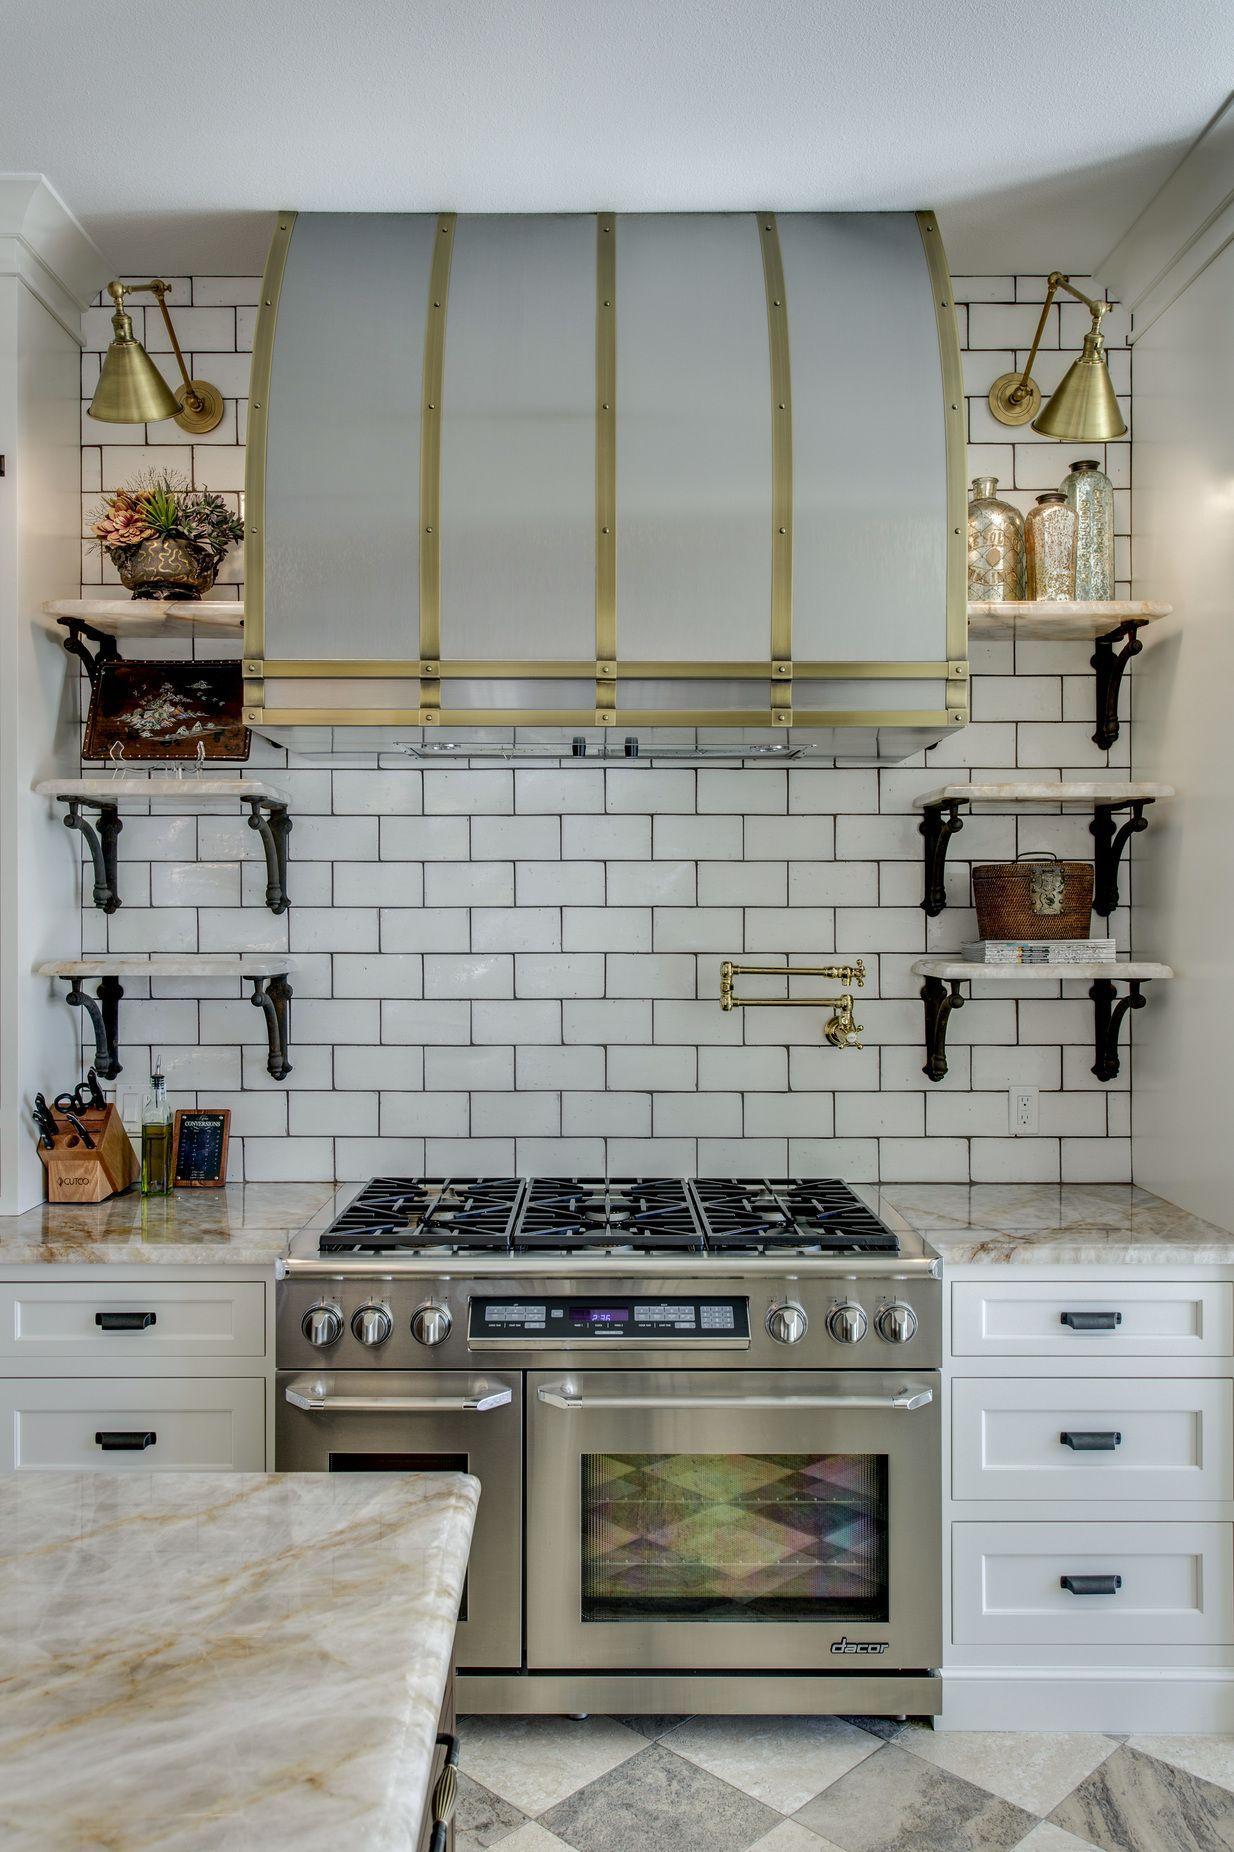 10x10 Kitchen Remodel: 11+ Thrilling Small Kitchen Remodel 10x10 Ideas